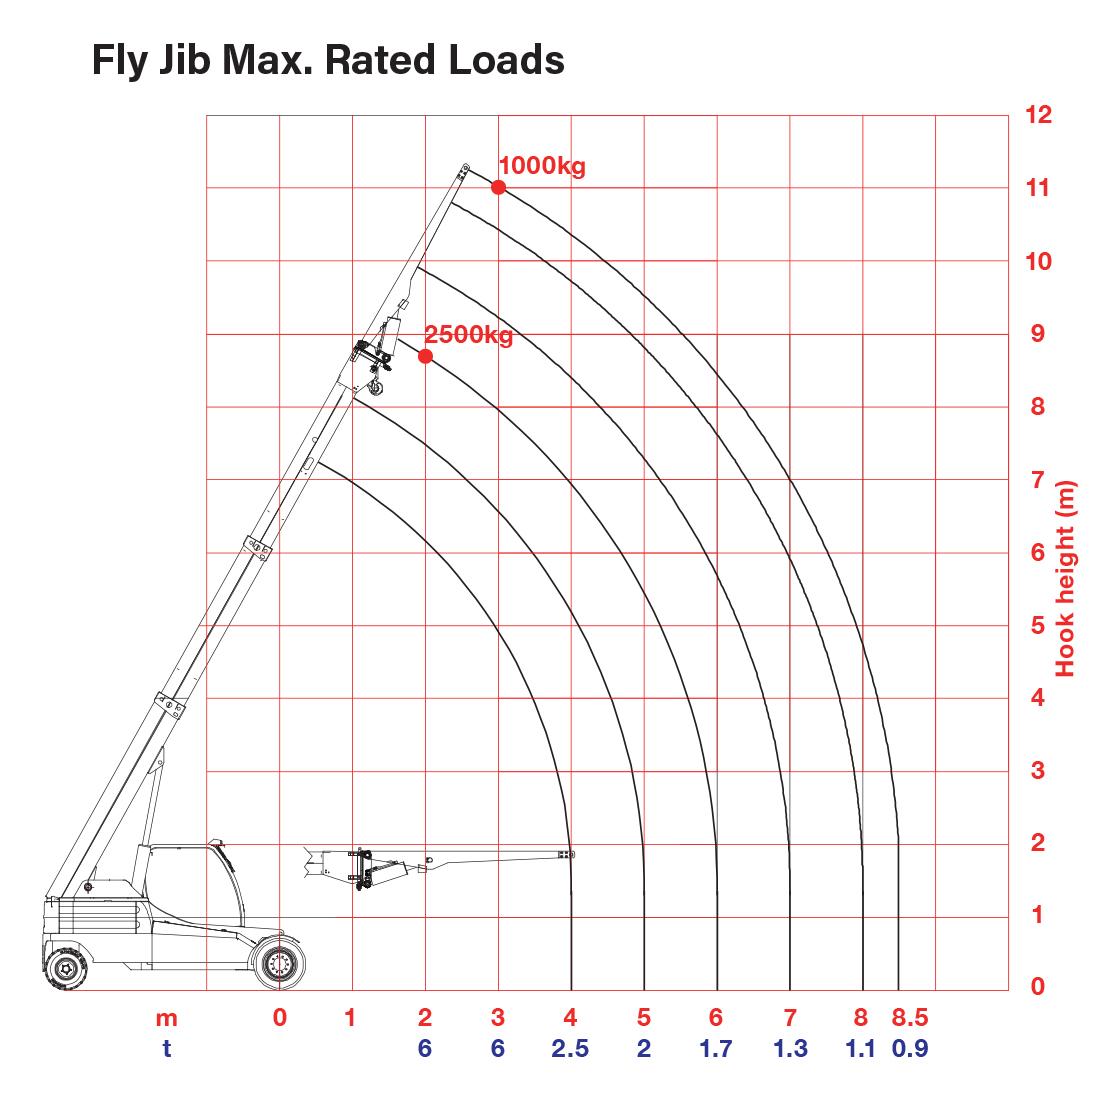 GF100 - Fly Jib Rated Loads